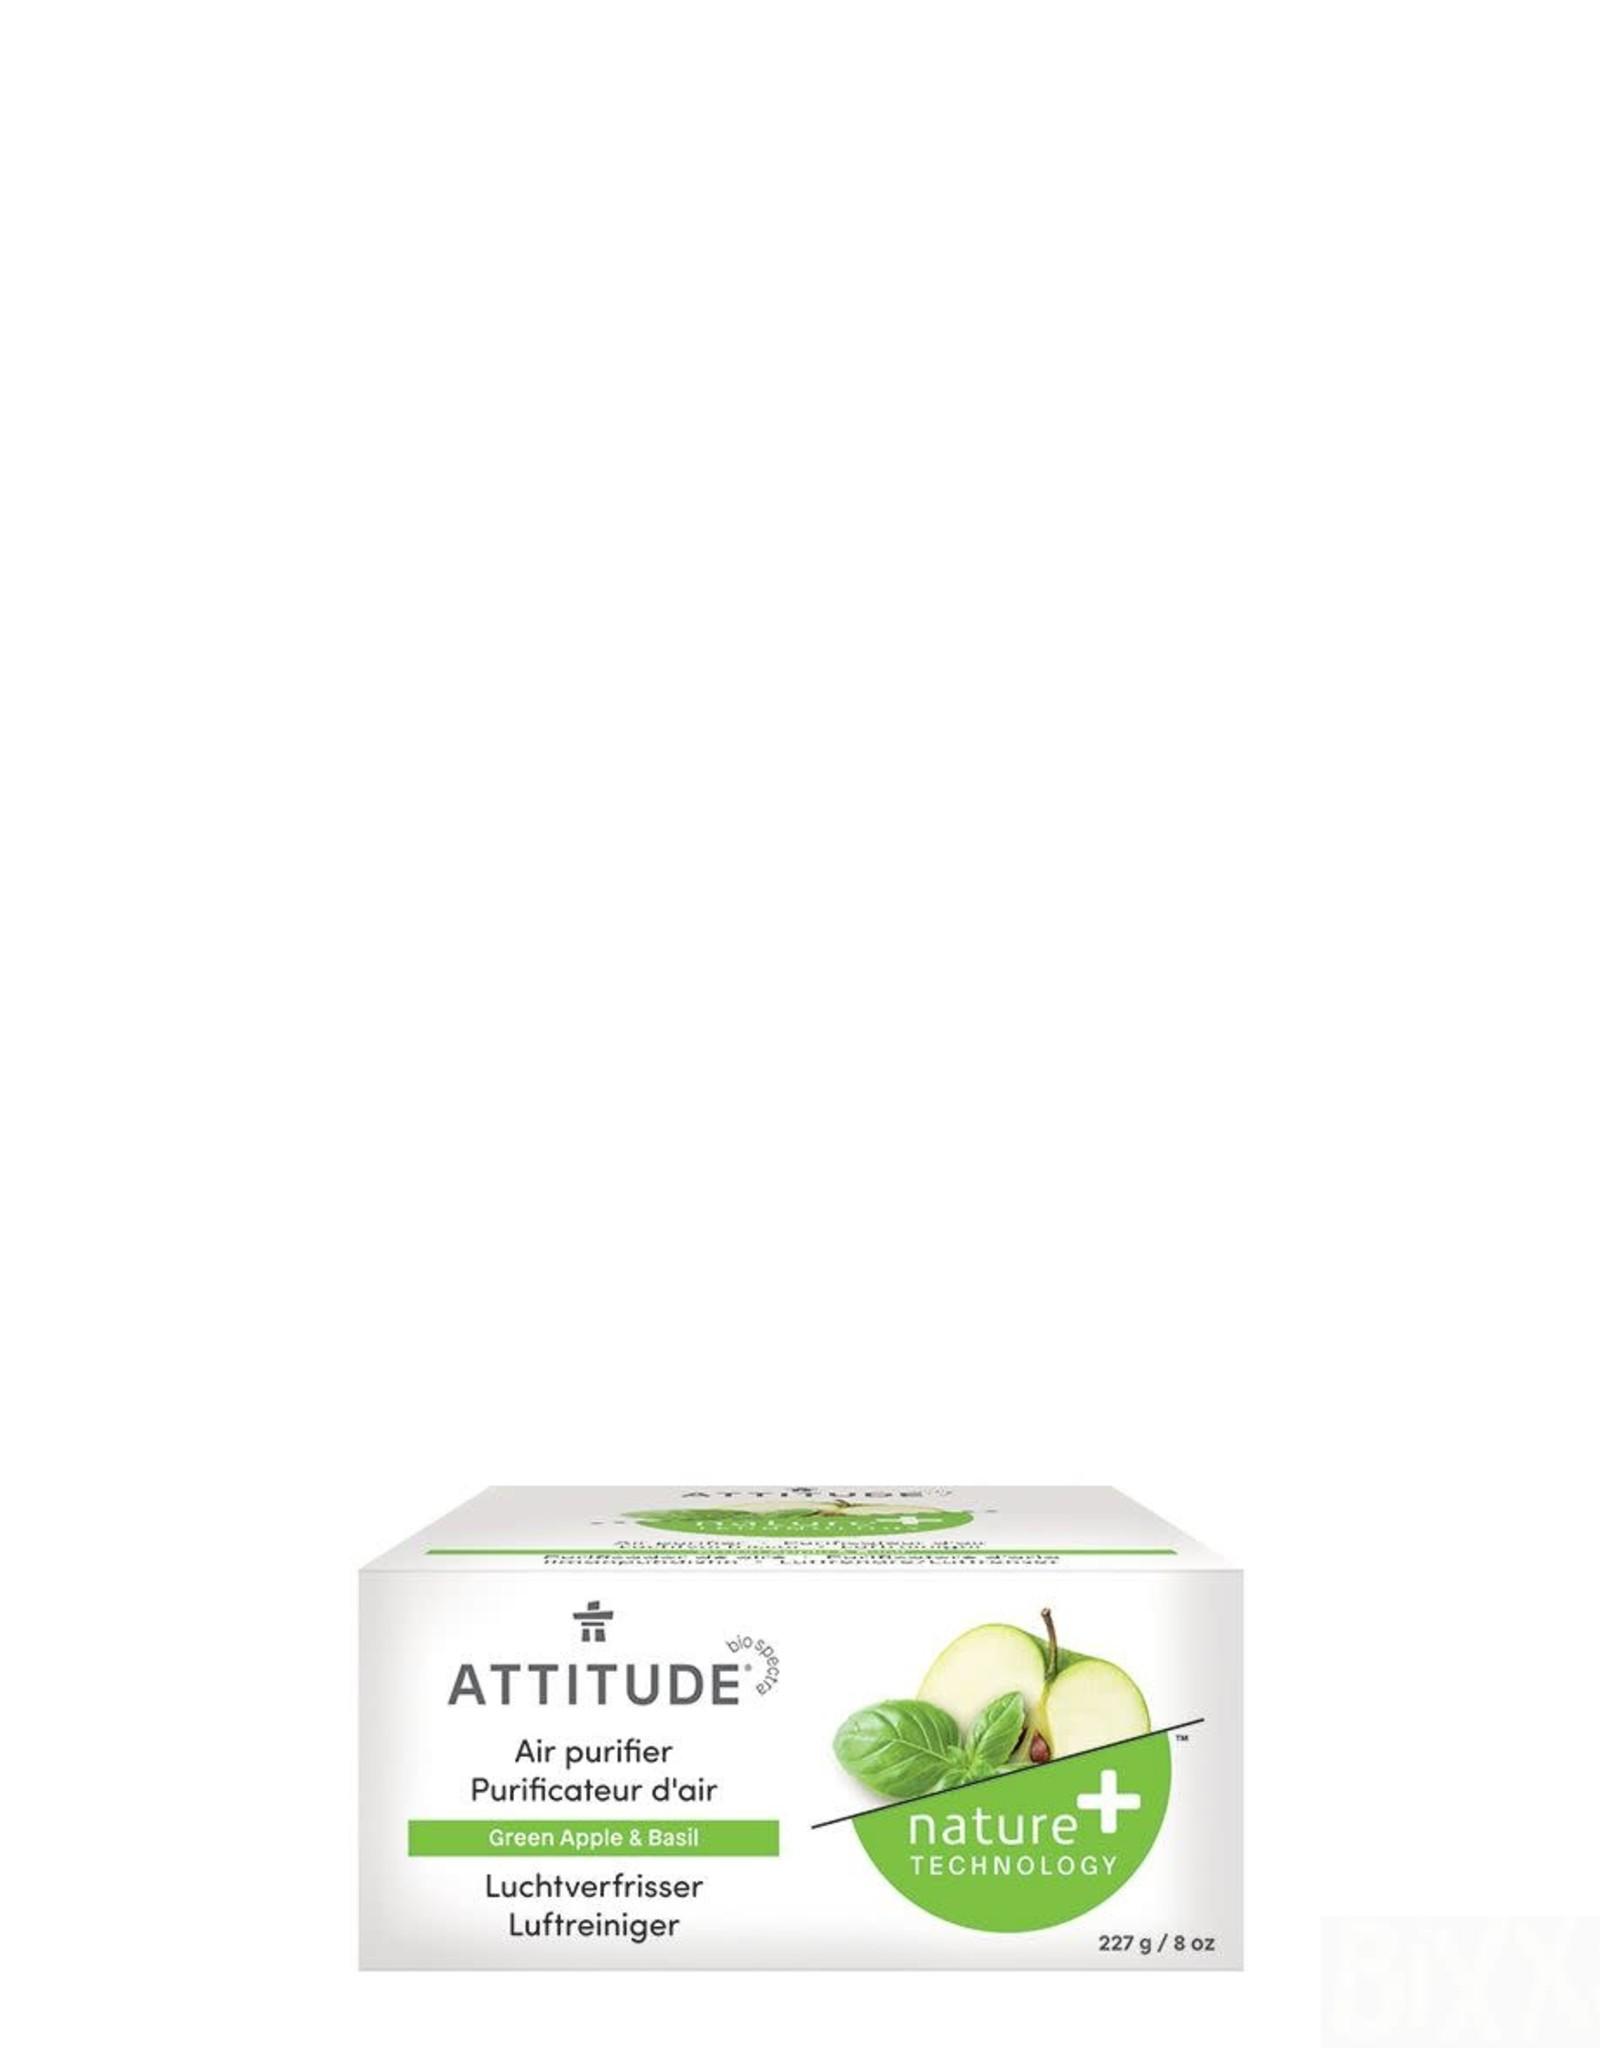 Attitude Attitude Luchtverfrisser green apple & basil 227 g